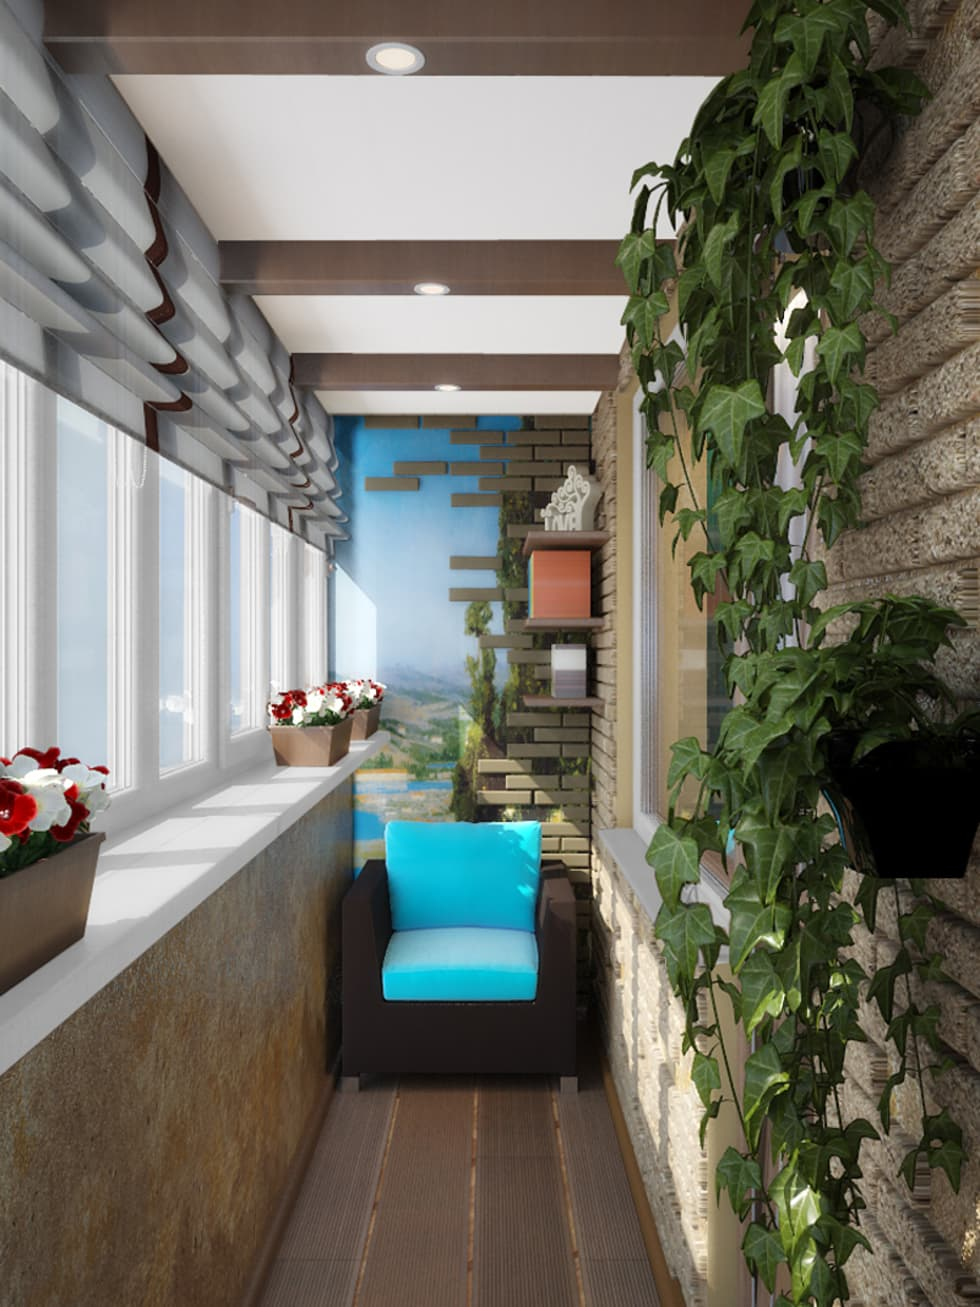 Fotos de terrazas de estilo en de симуков святослав частный .